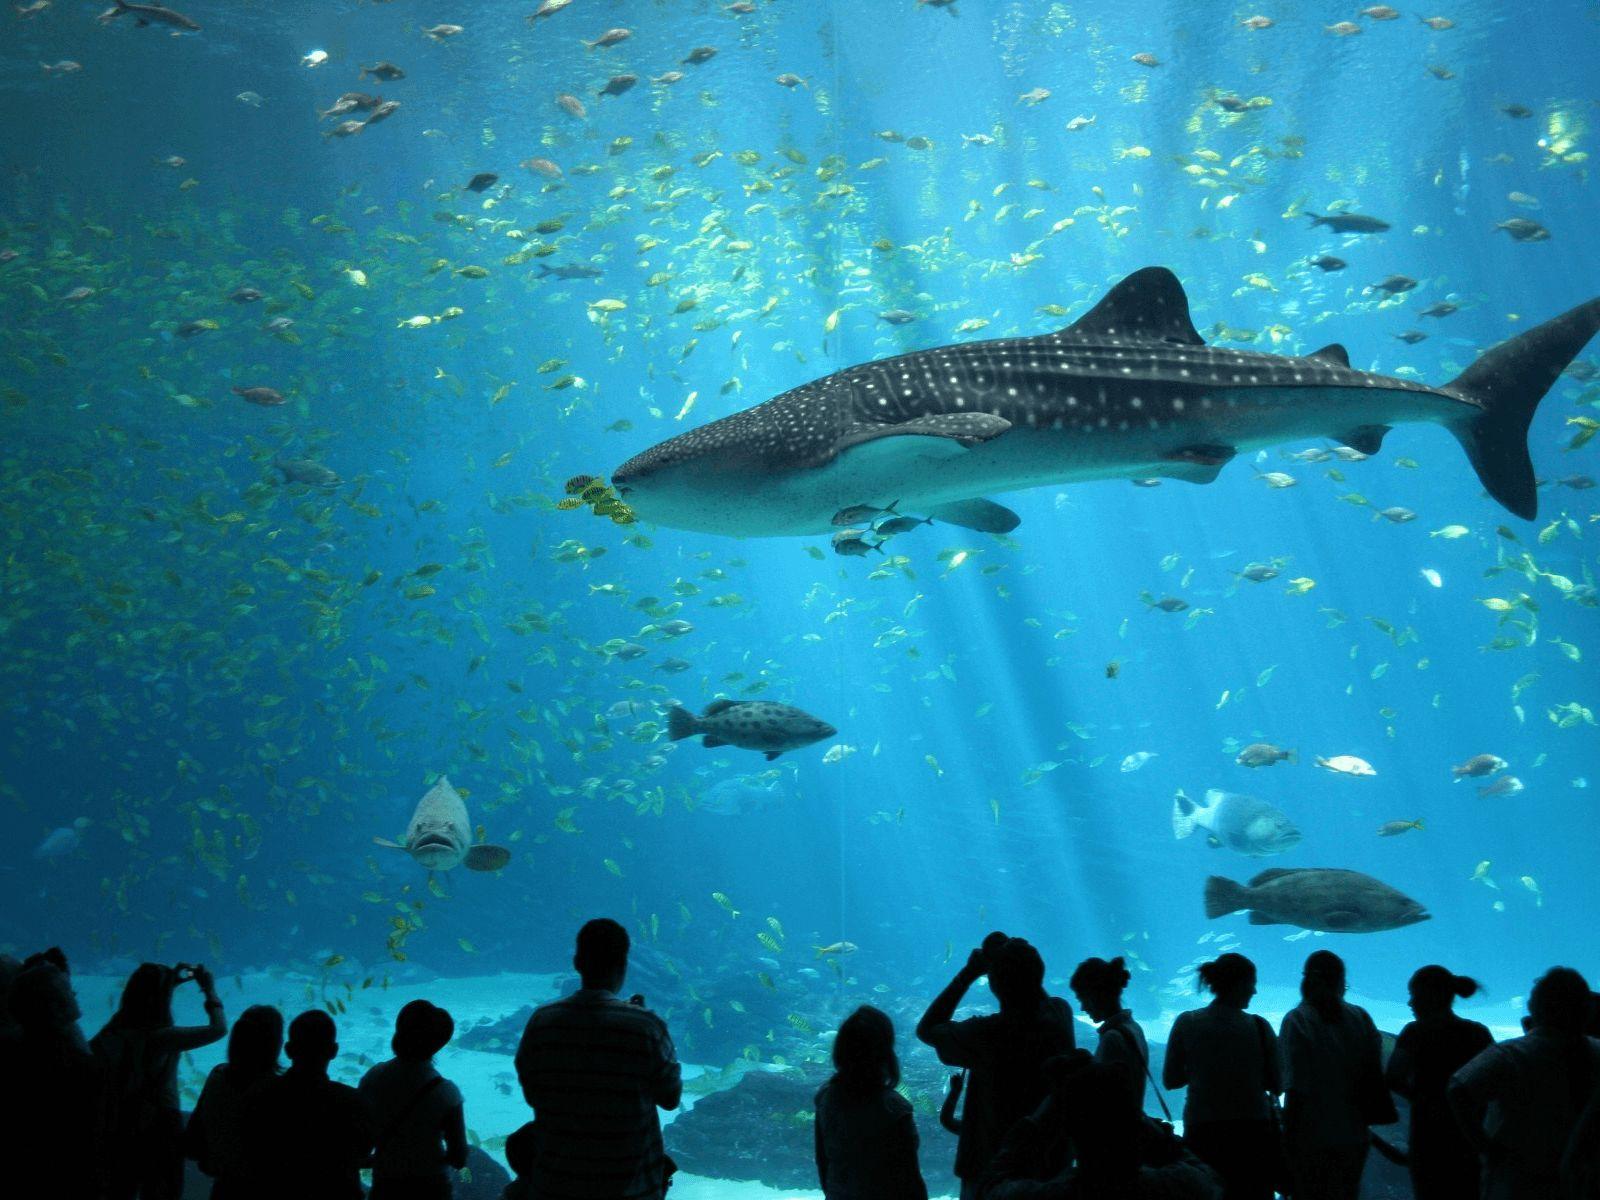 Sjeverna Italija i ljetovalište Rimini: Sea life aquarium